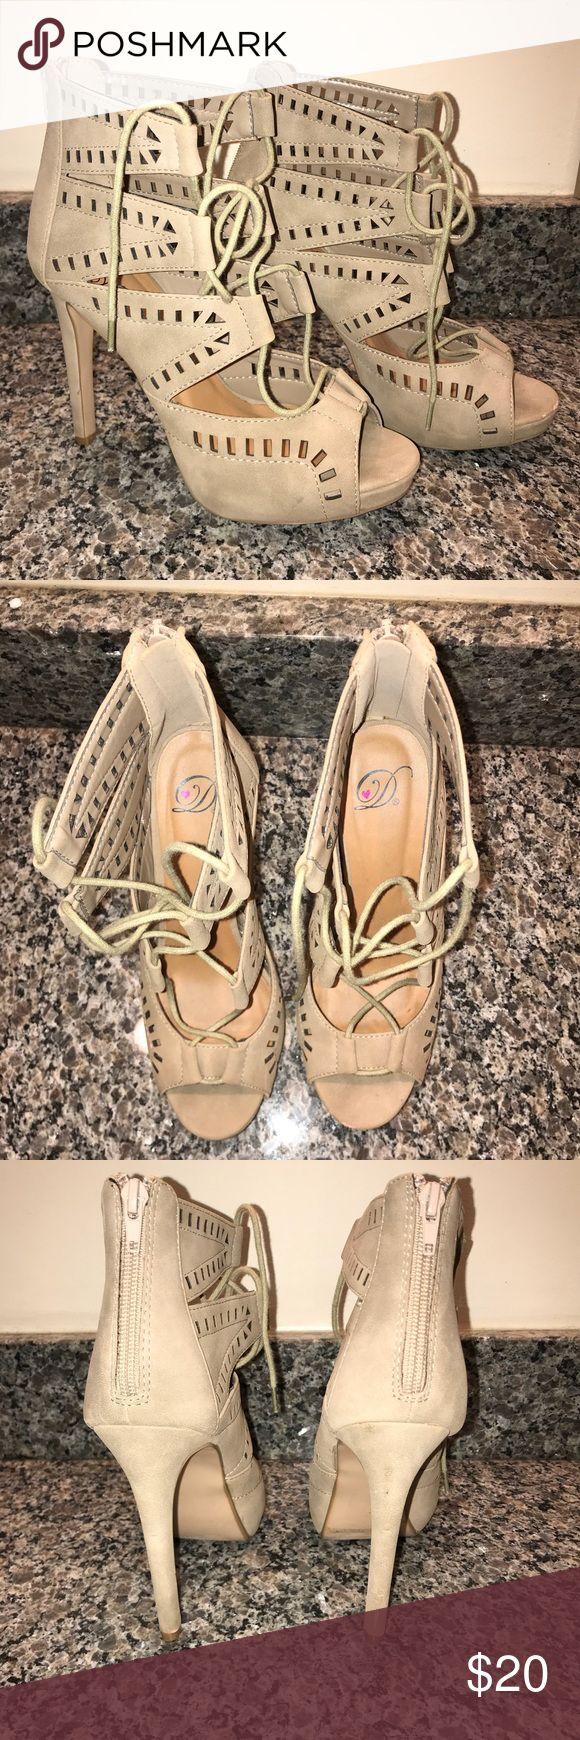 High heel platforms Pair of beige suede laser-cut heels with a zip-up back. Size 7 1/2. Shoes Platforms